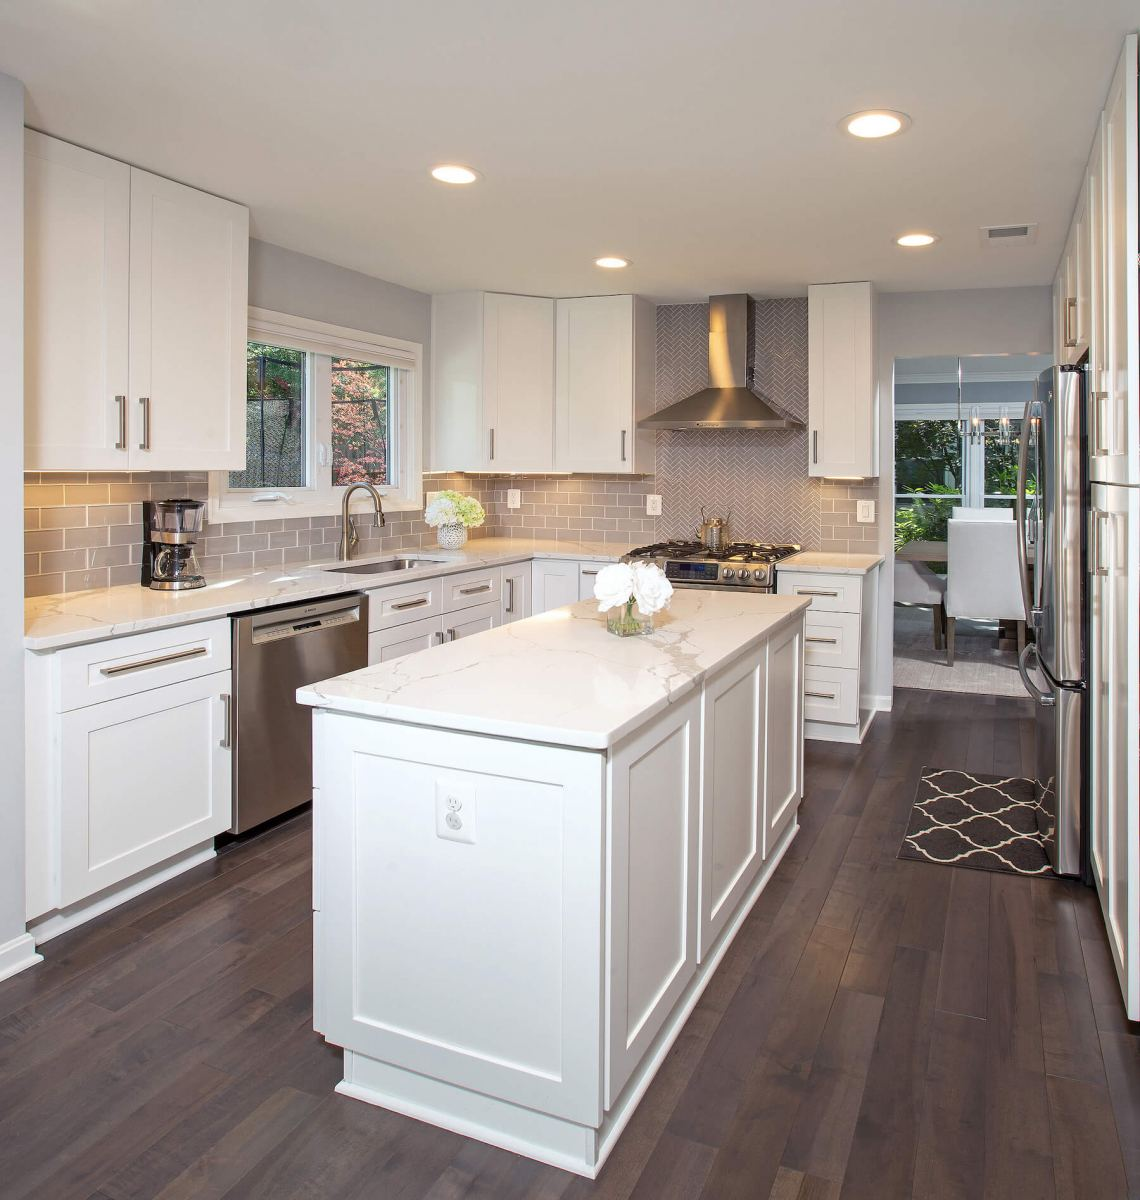 kitchen_R_V_5-24-19_6295